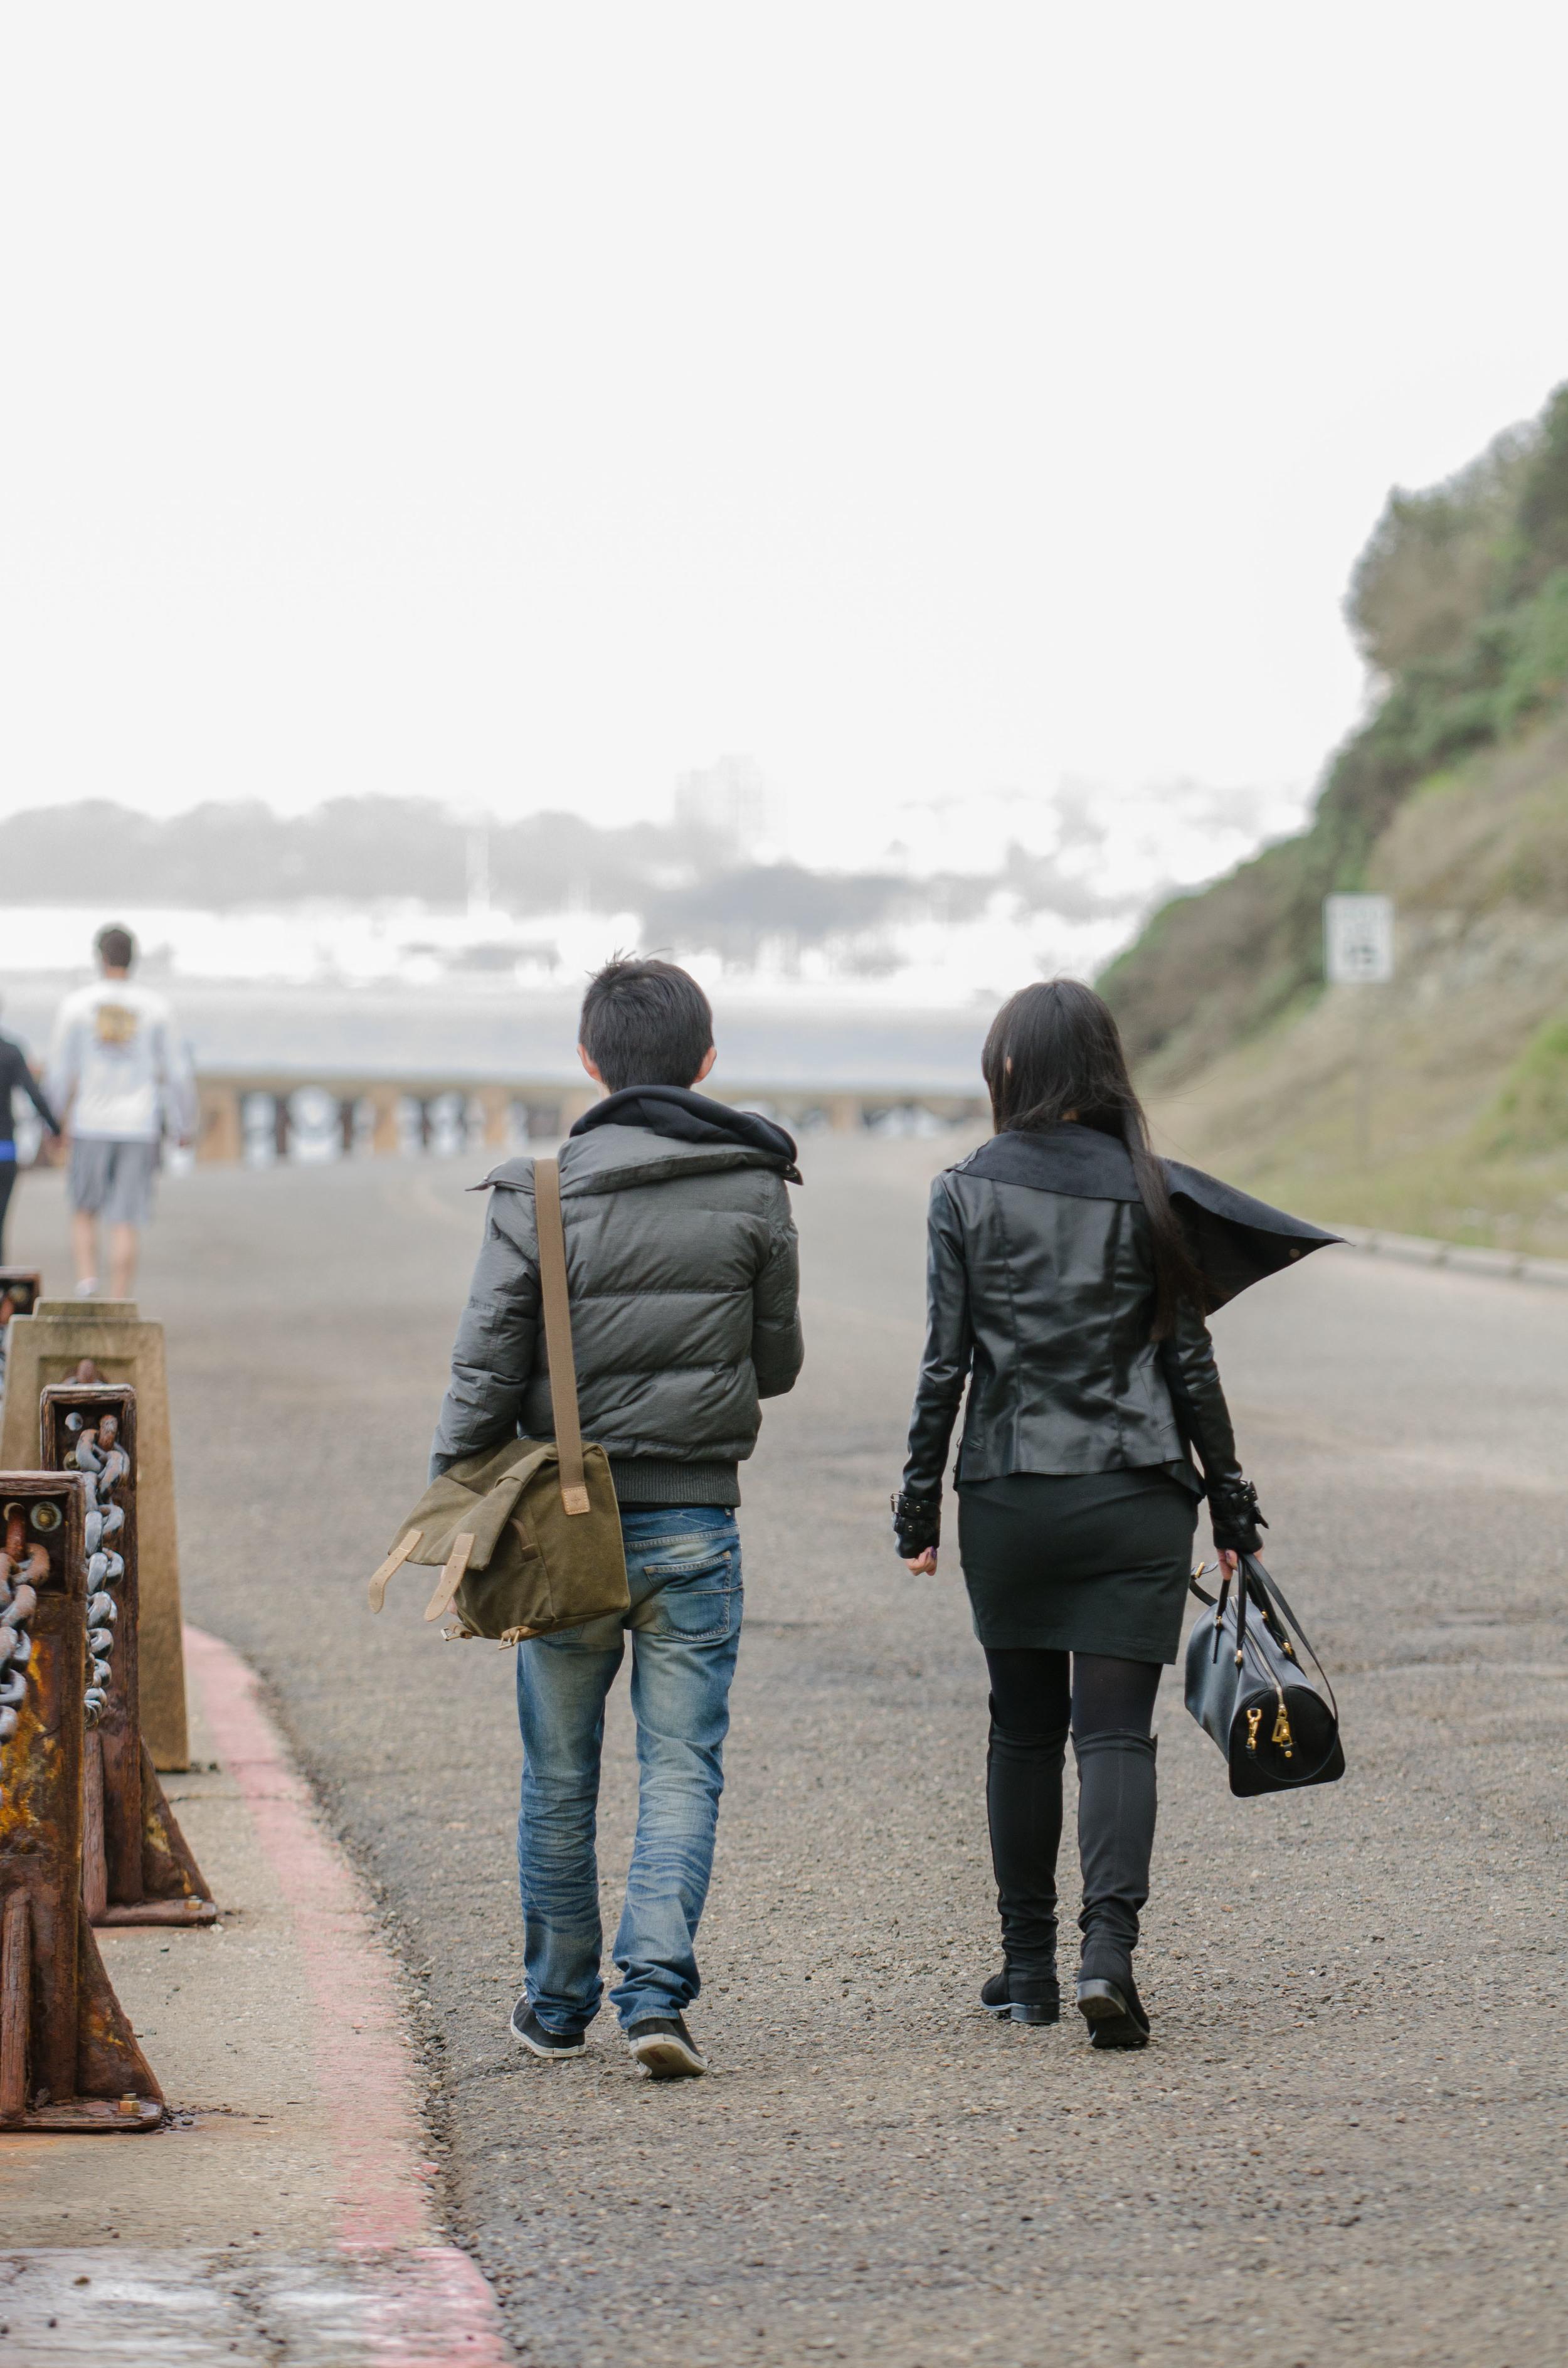 A walk from the bridge, San Francisco, CA